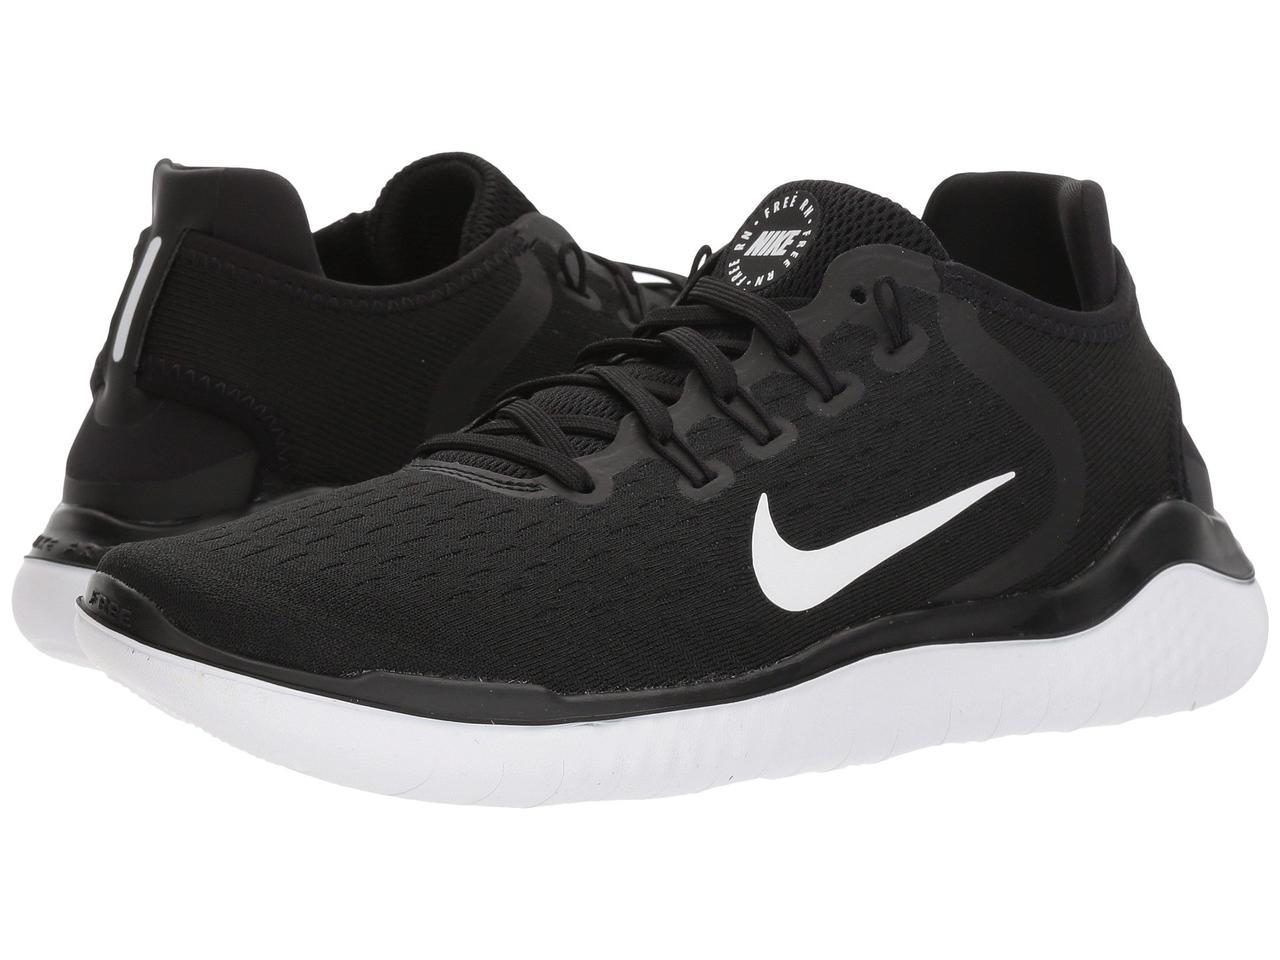 c721f9c145ece9 Кроссовки/Кеды (Оригинал) Nike Free RN 2018 Black/White, цена 3 100 ...